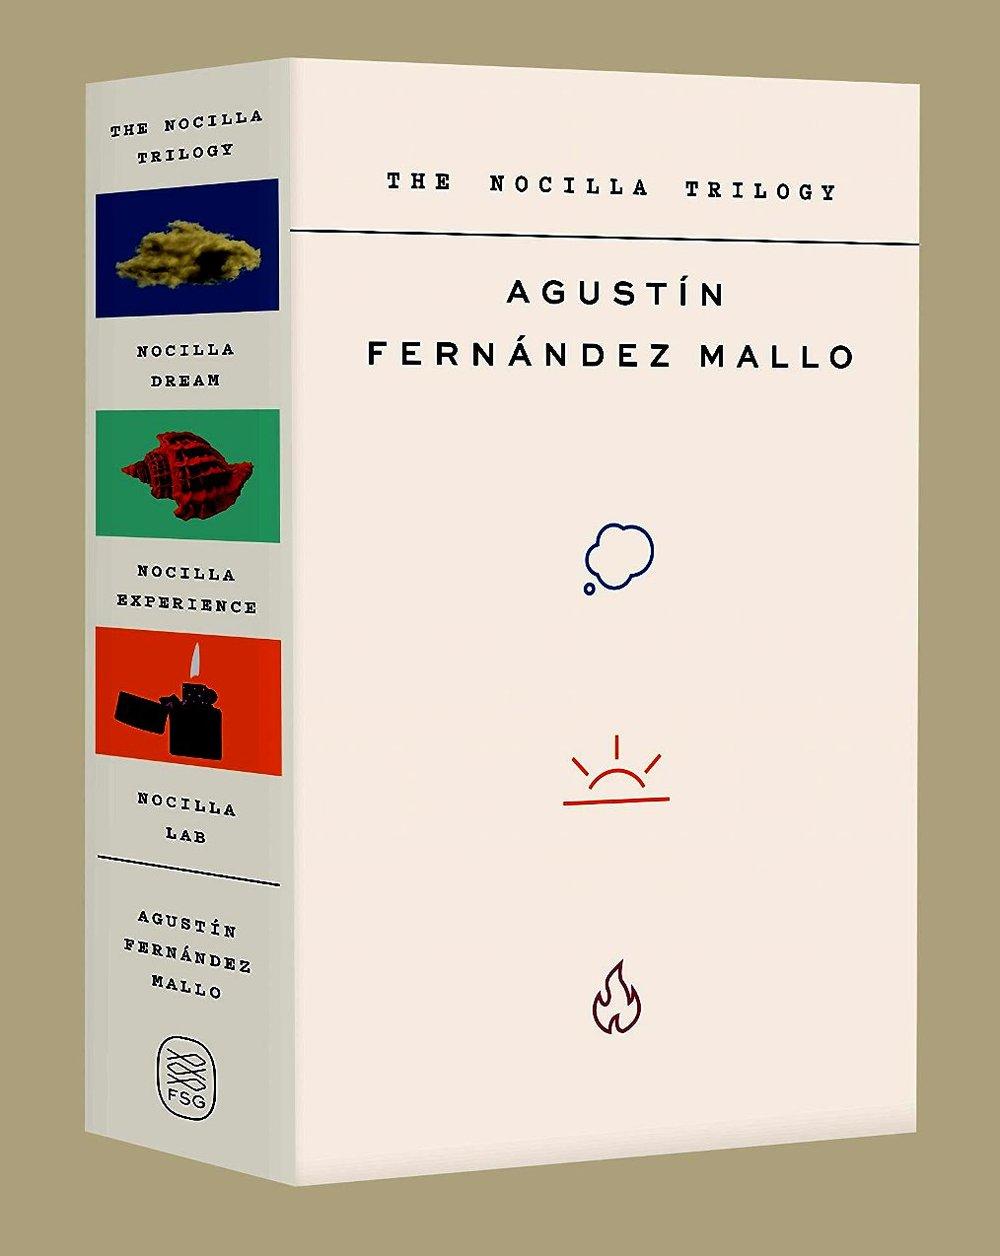 The Nocilla Trilogy: Nocilla Dream, Nocilla Experience, Nocilla Lab  by  Agustín Fernández Mallo  tr.  Thomas Bunstead  (Fitzcarraldo, 2017–2019; FSG, Feb. 2019)   Reviewed by Nick Oxford